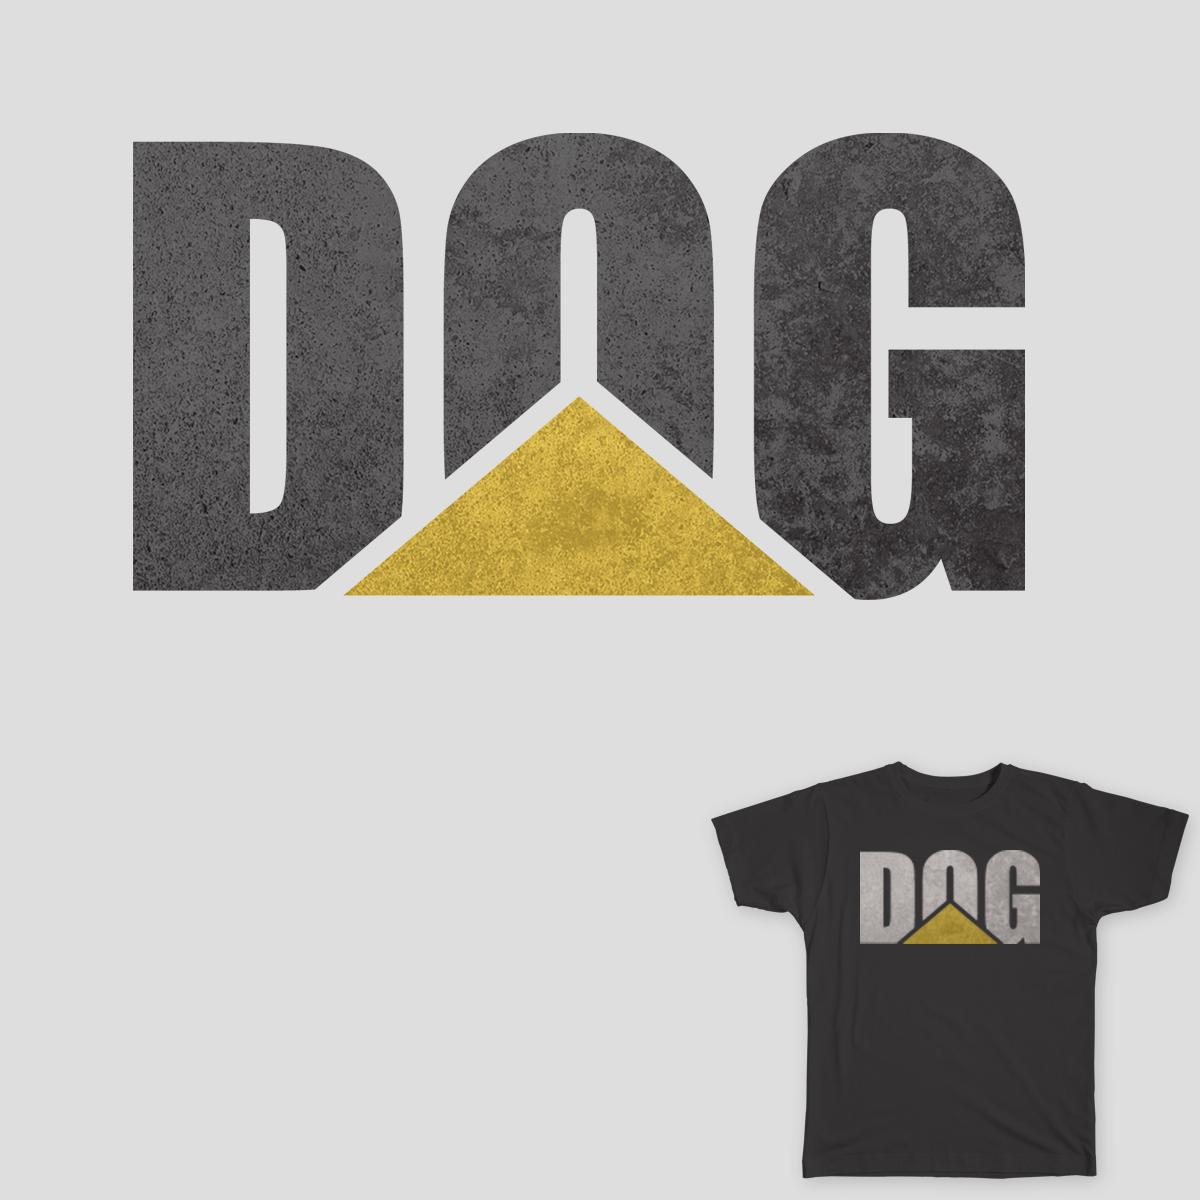 D.O.G. by eddie.carmine on Threadless